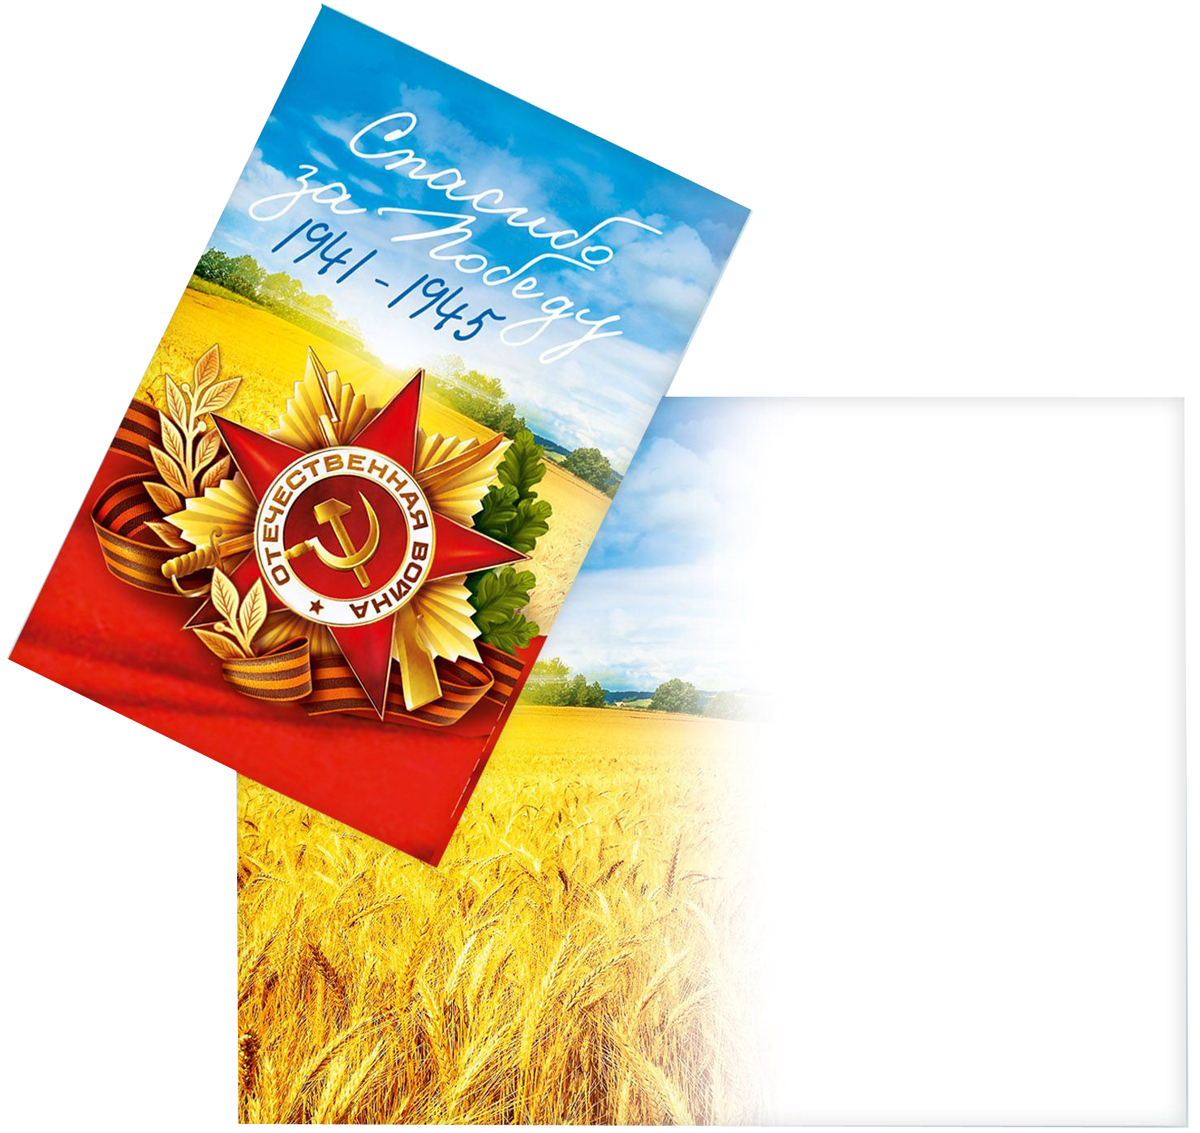 Открытка Дарите cчастье Спасибо за Победу!, 9 х 6 см открытка дарите cчастье с праздником 9 мая 9 х 6 см